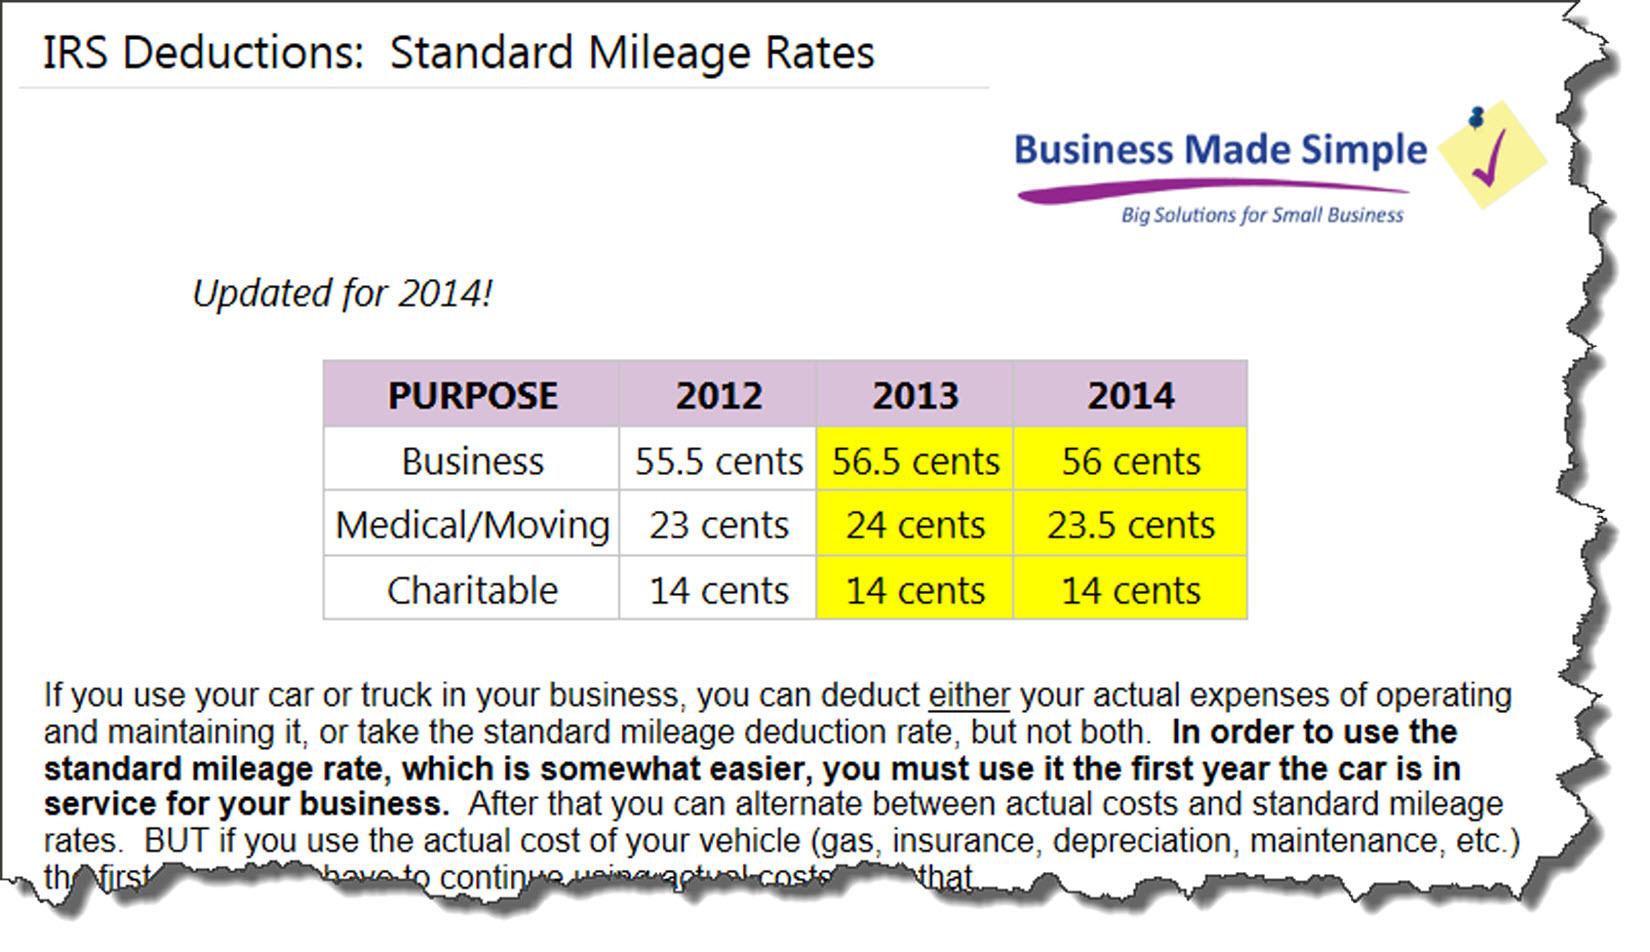 Reimbursable Business Travel Expenses Irs